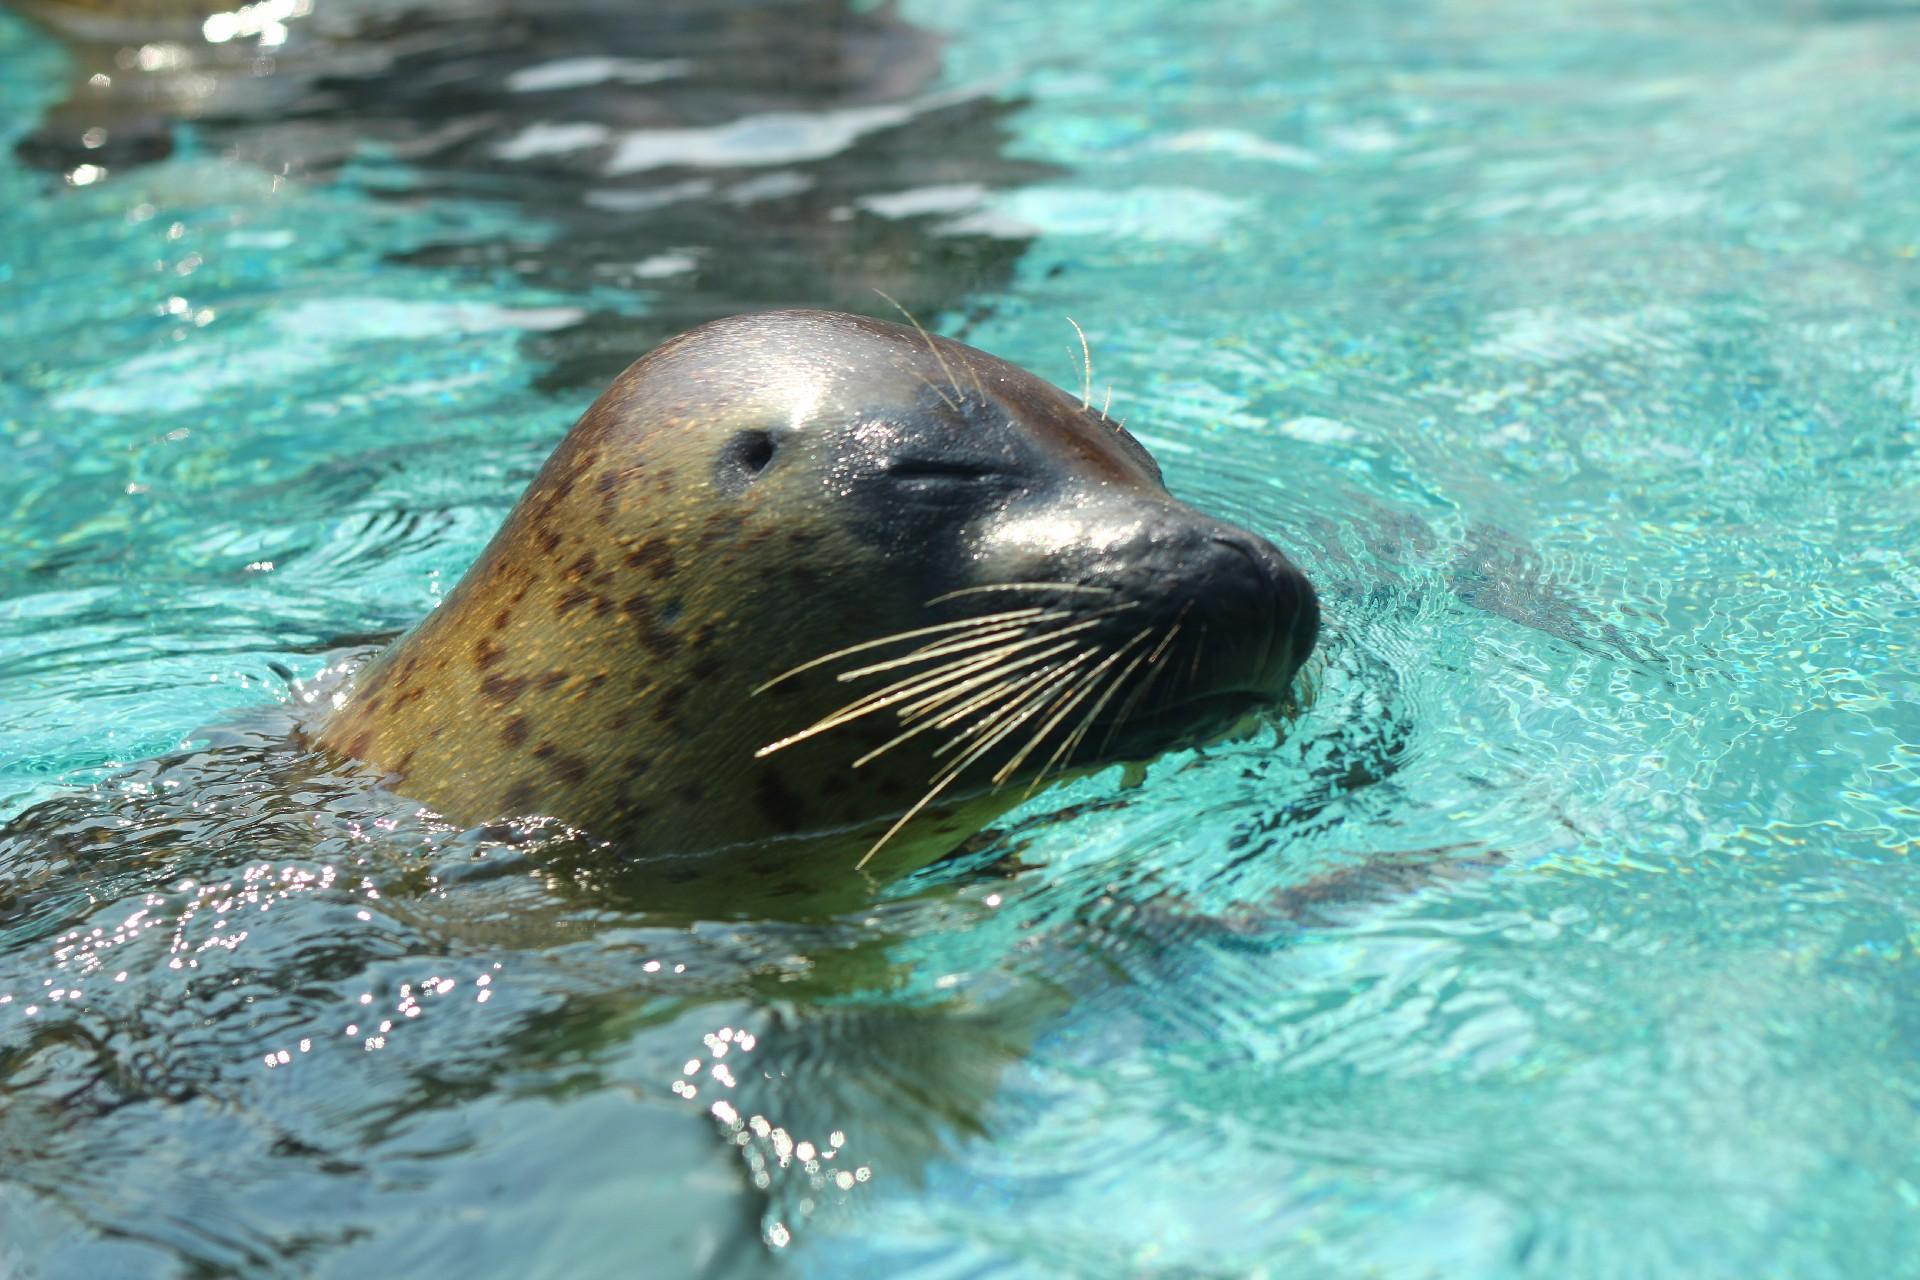 JAFは?竹島水族館の7つの割引方法と基本料金まとめ【+営業時間、交通アクセス、駐車場など】